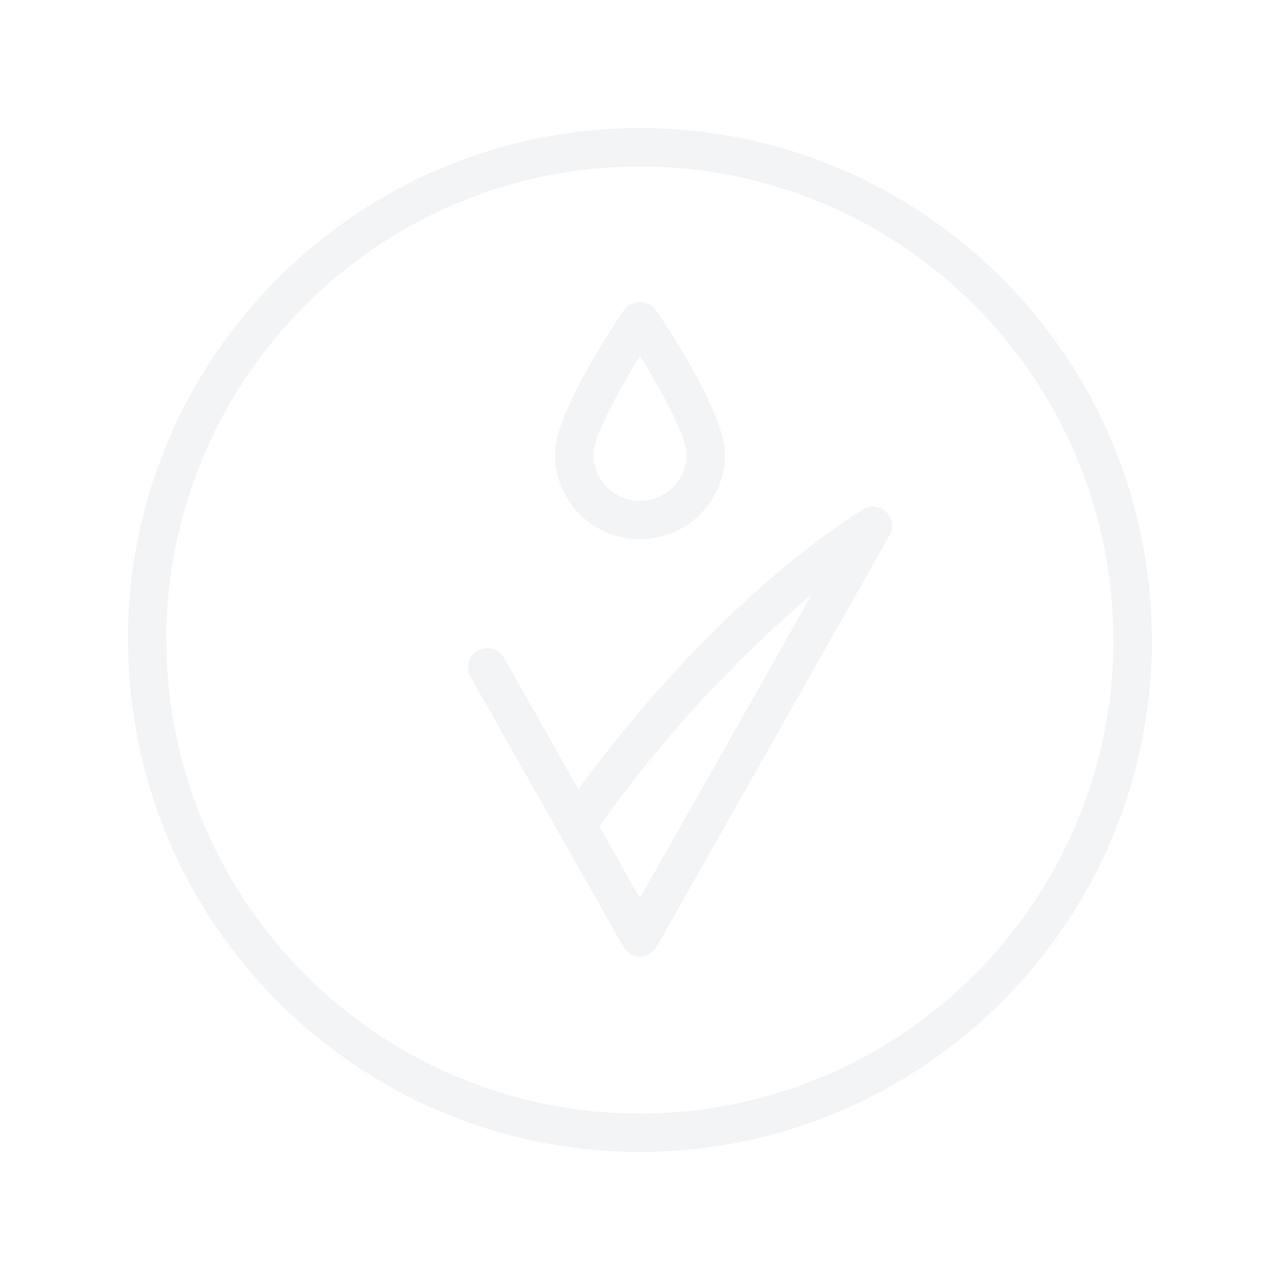 Lancome Grandiose Mascara No.01 Noir Mirifique 10ml